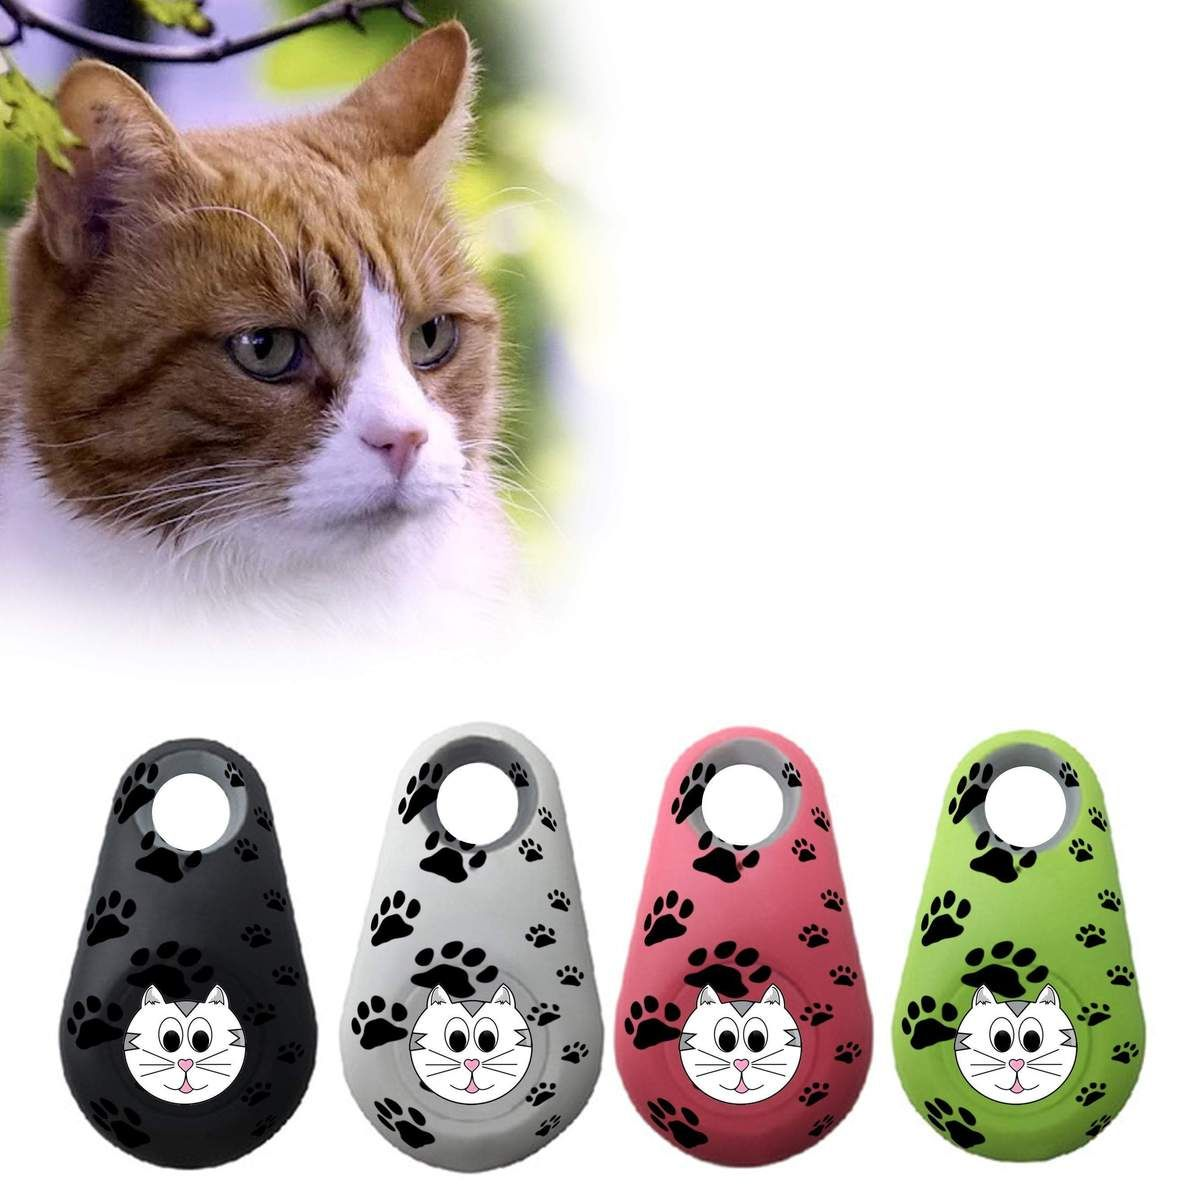 2018 Cats Smart Mini GPS Tracker Waterproof Bluetooth